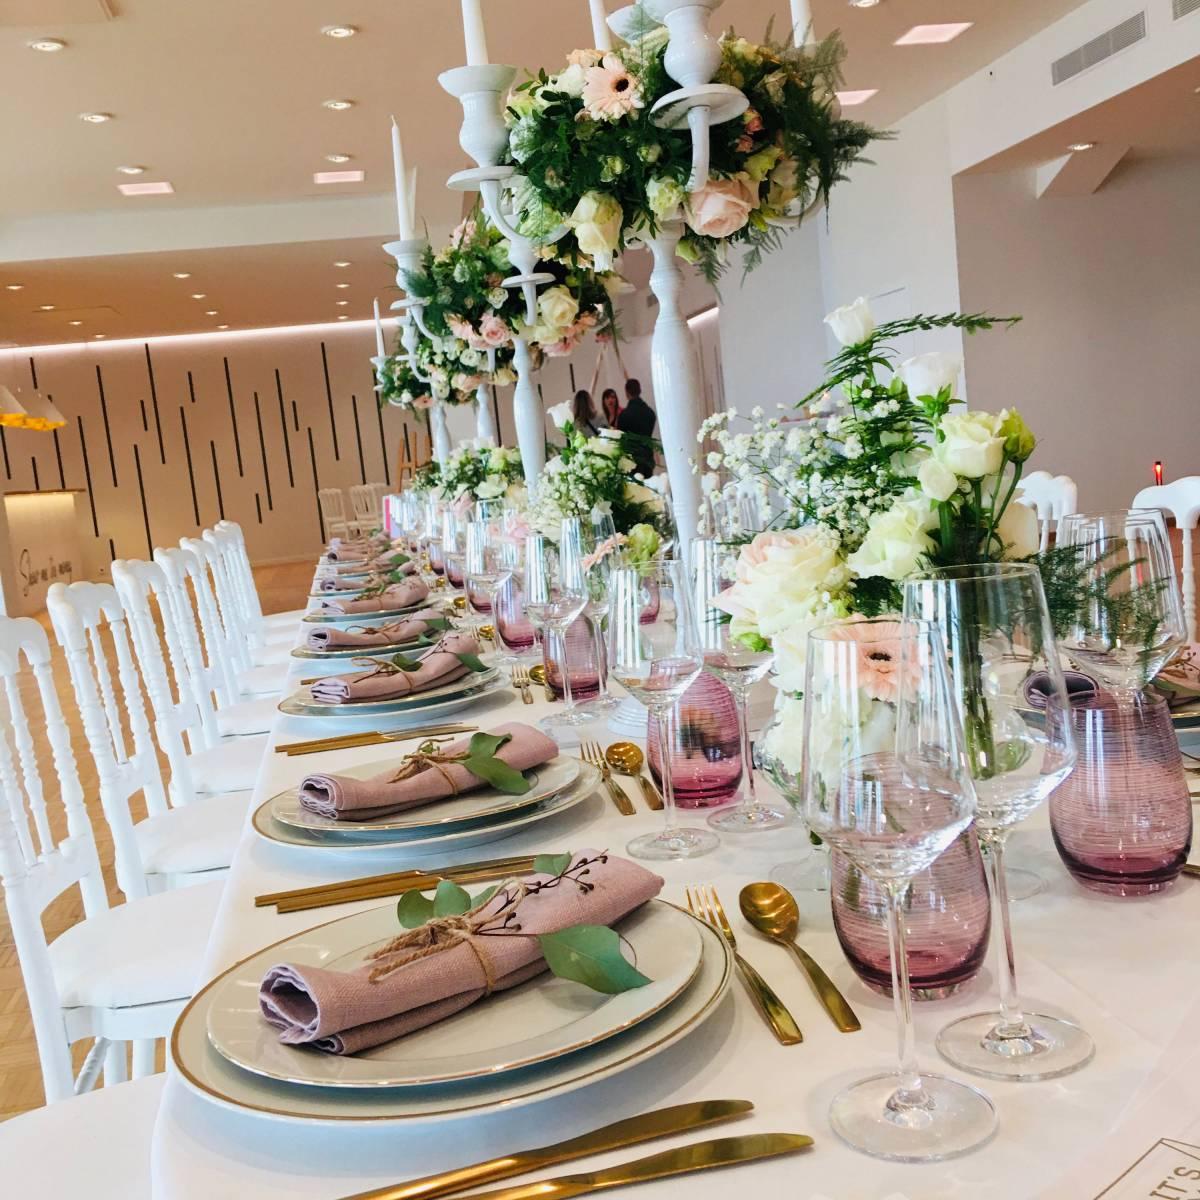 Maison Fleurie - Fotograaf zelfgetrokken - House of Weddings - 7